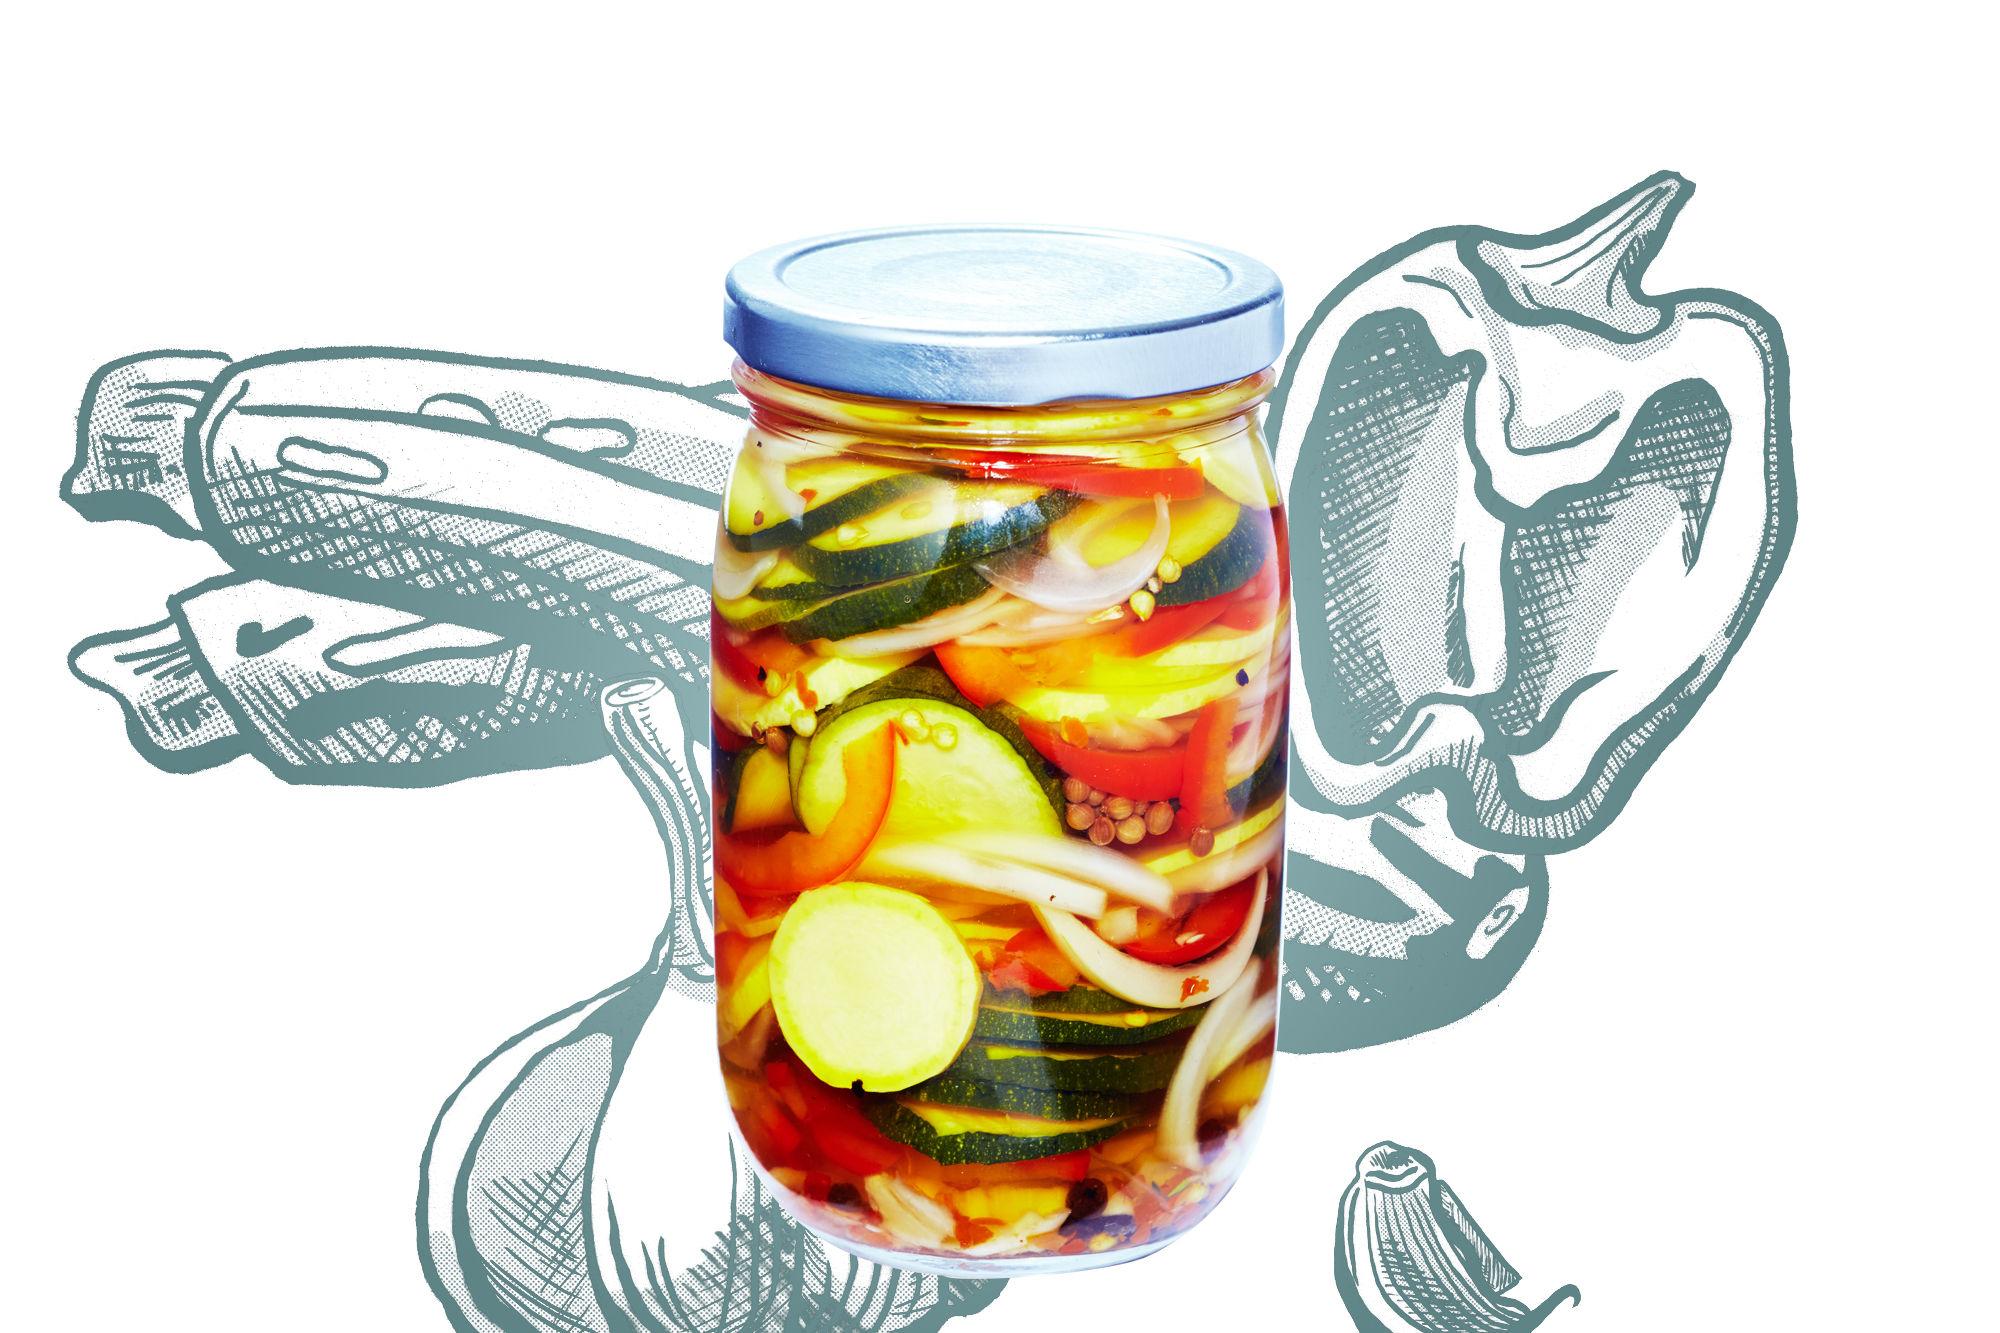 Jis 0616 summer pickles fjgisr